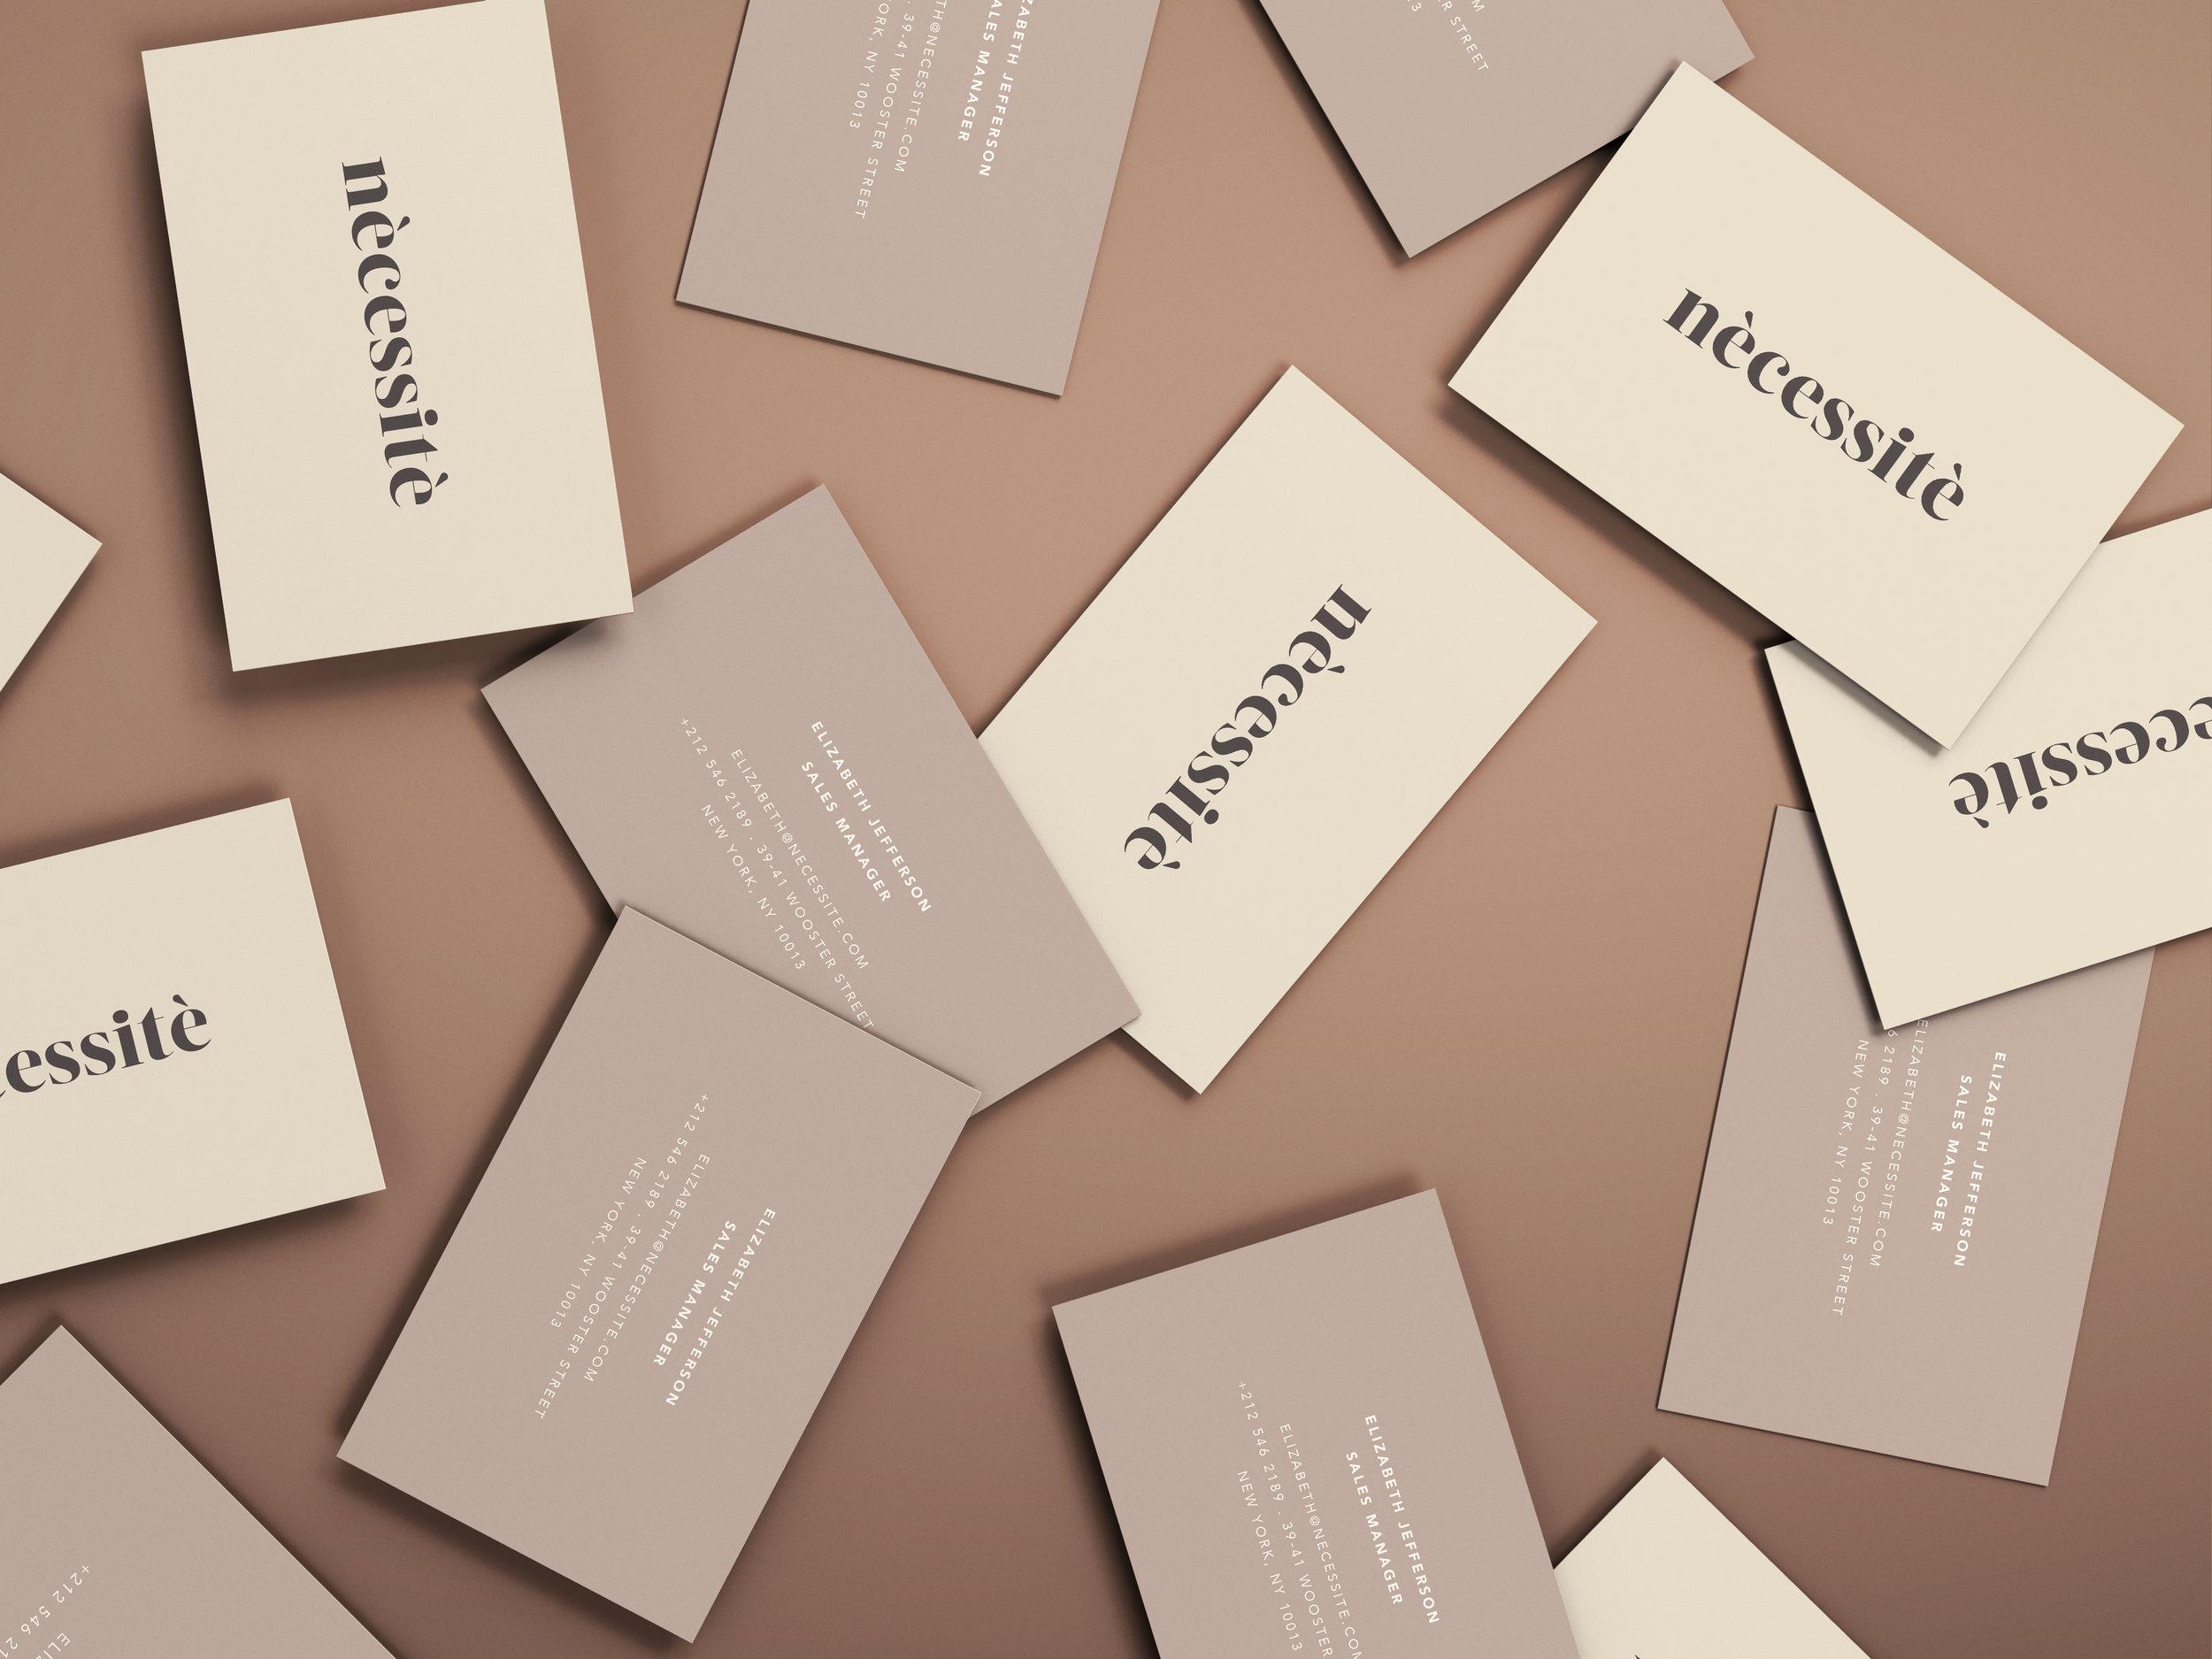 NECESSITE Business Cards Mockup.jpg